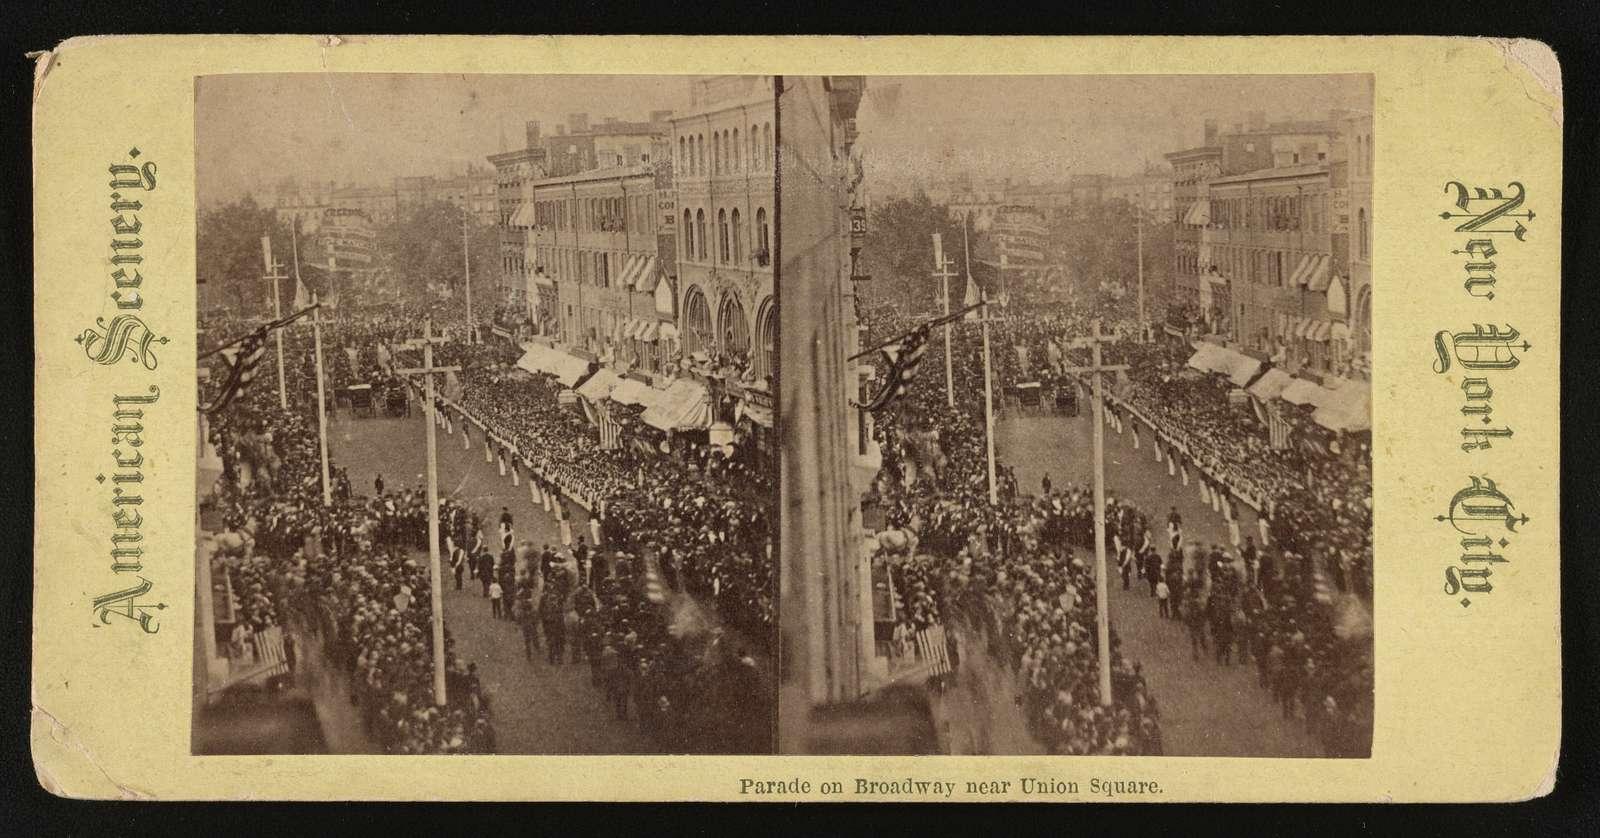 Parade on Broadway near Union Square